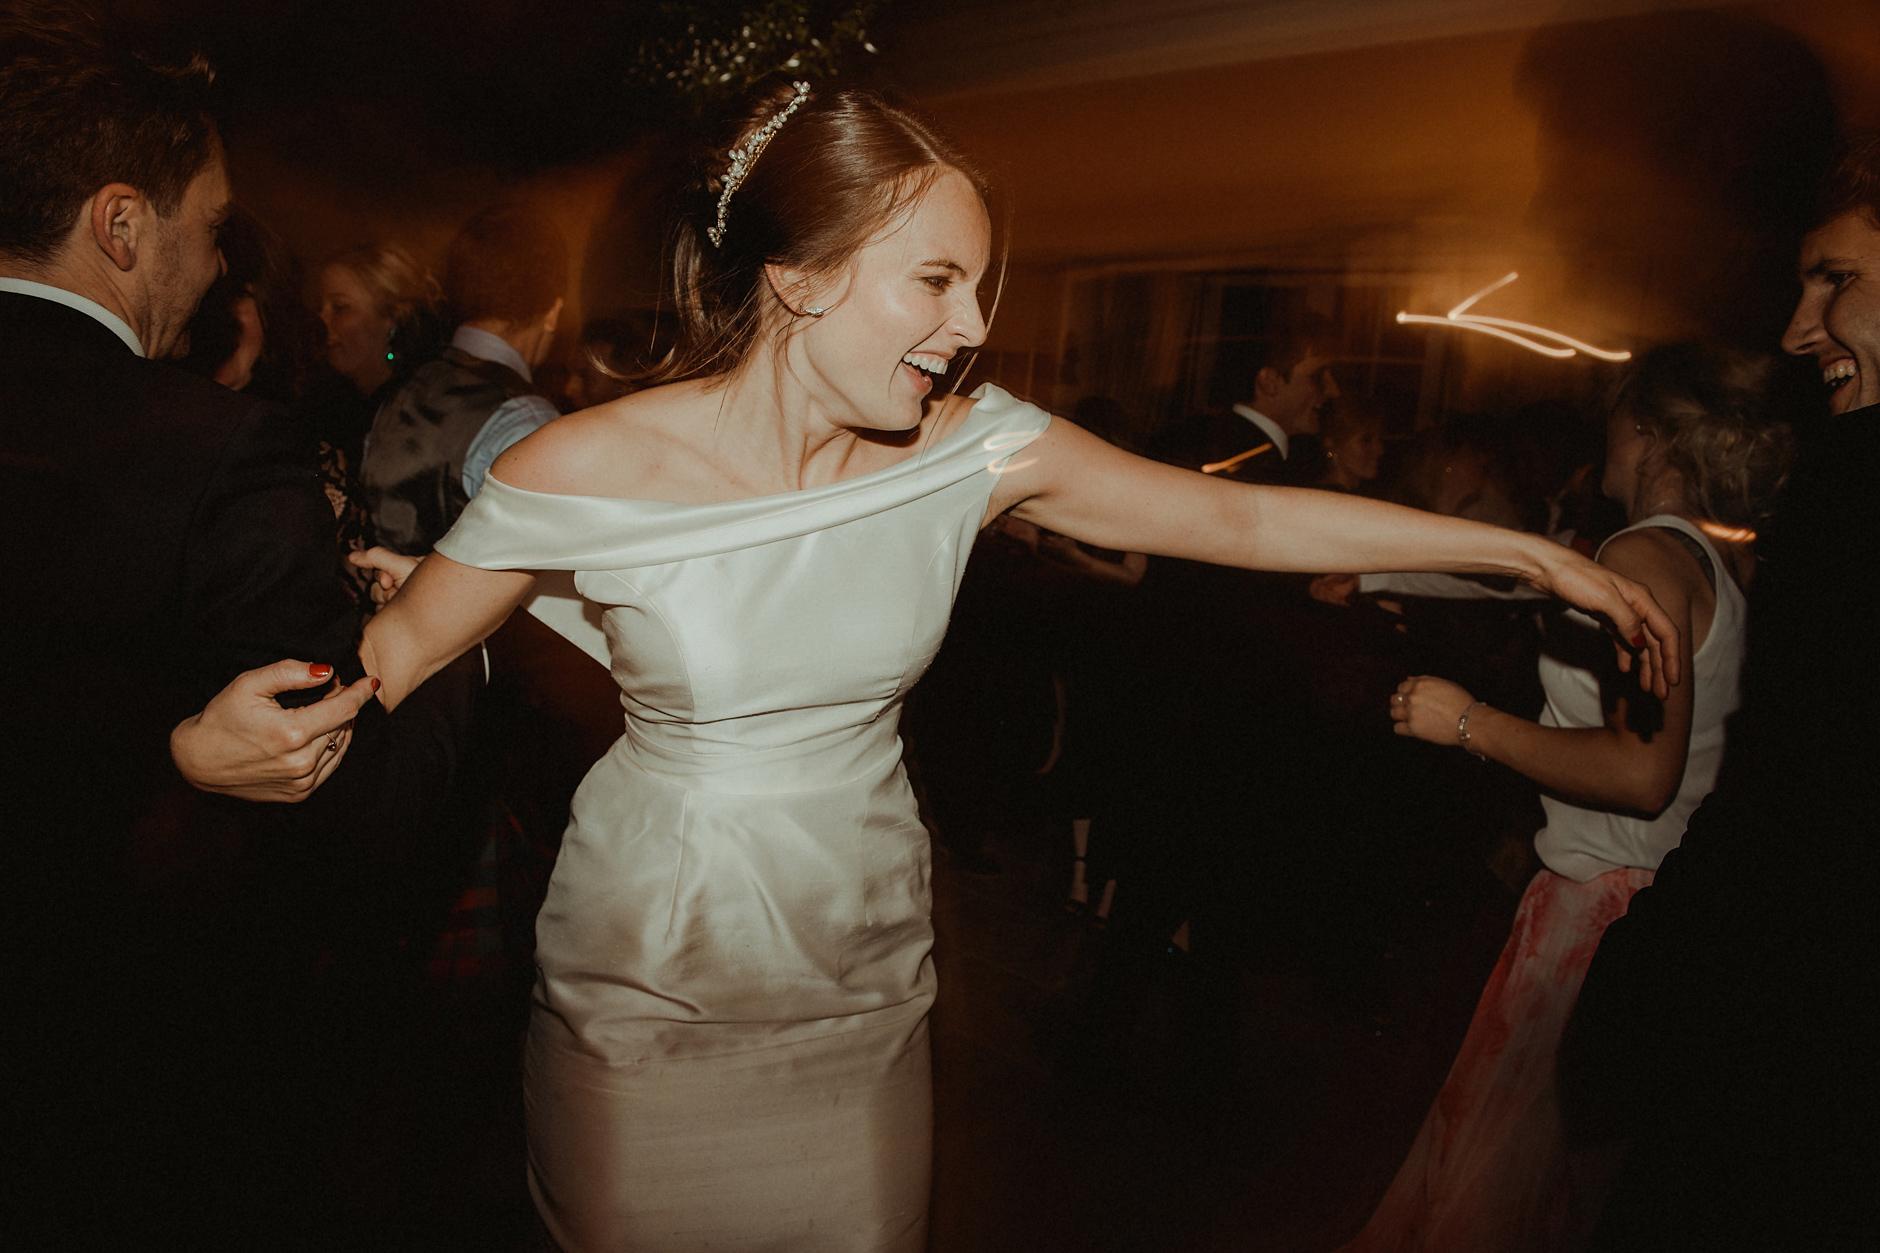 Glentruim-Wedding-Nikki-Leadbetter-Photography-385.jpg